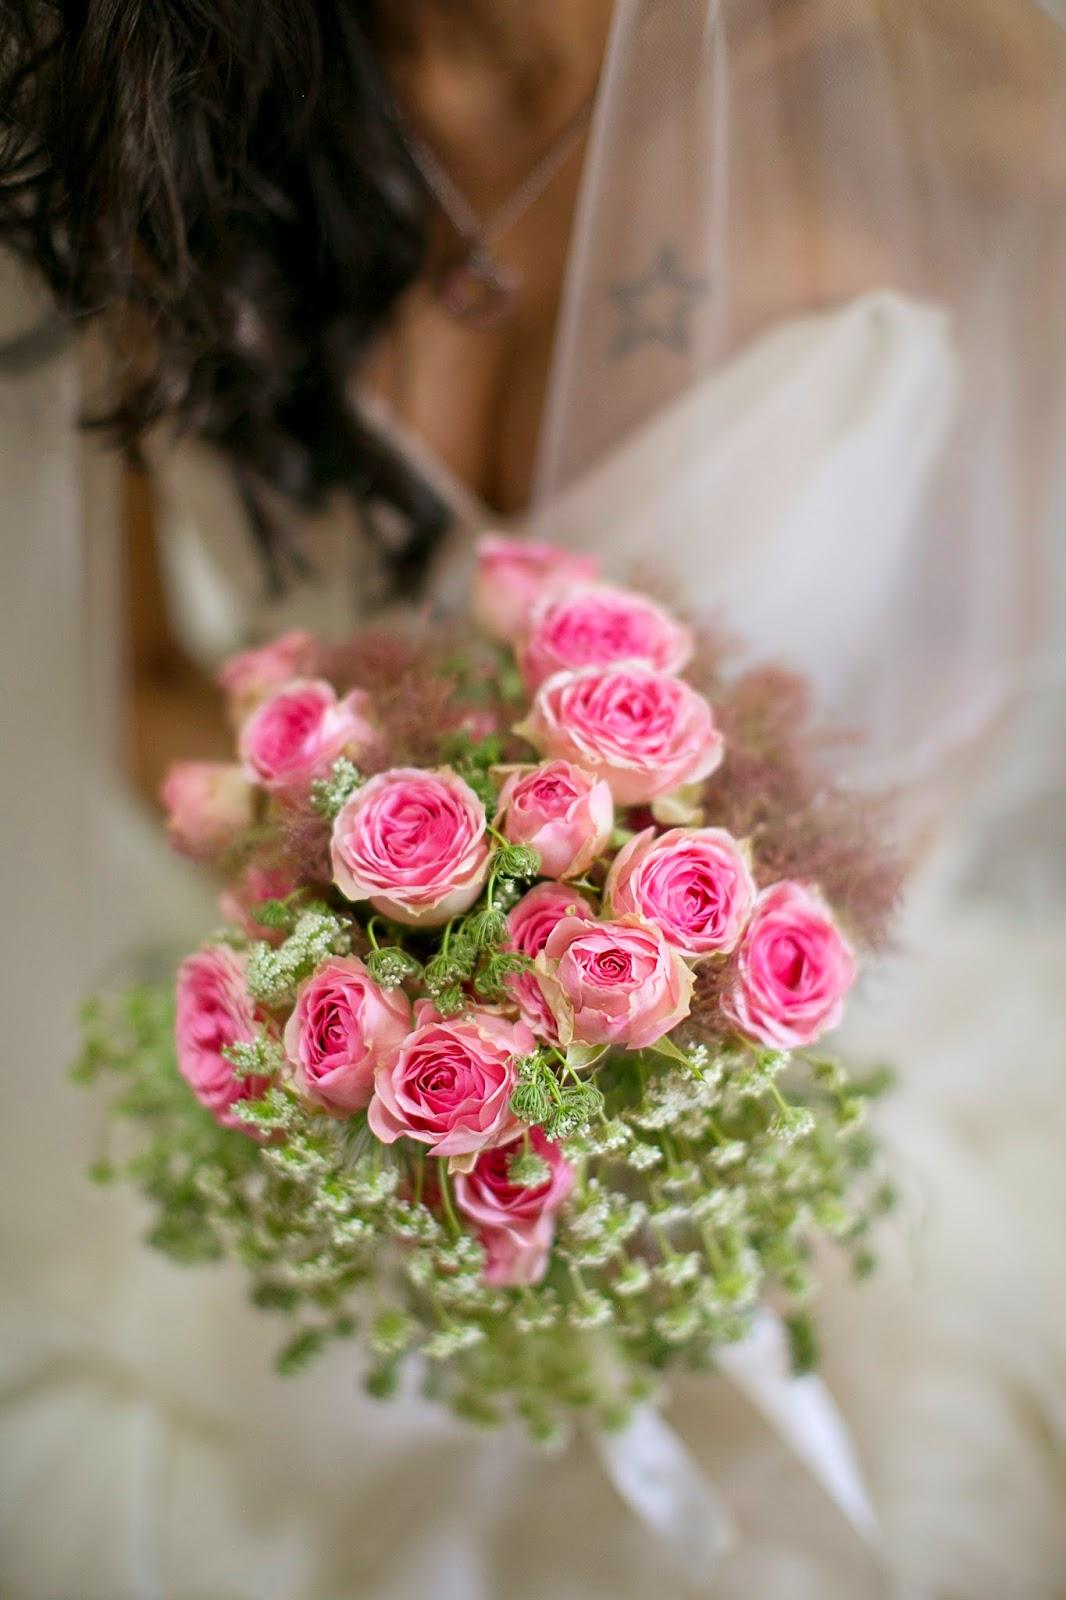 Wedding Day Photo Diary - Travel, Photography, Motherhood